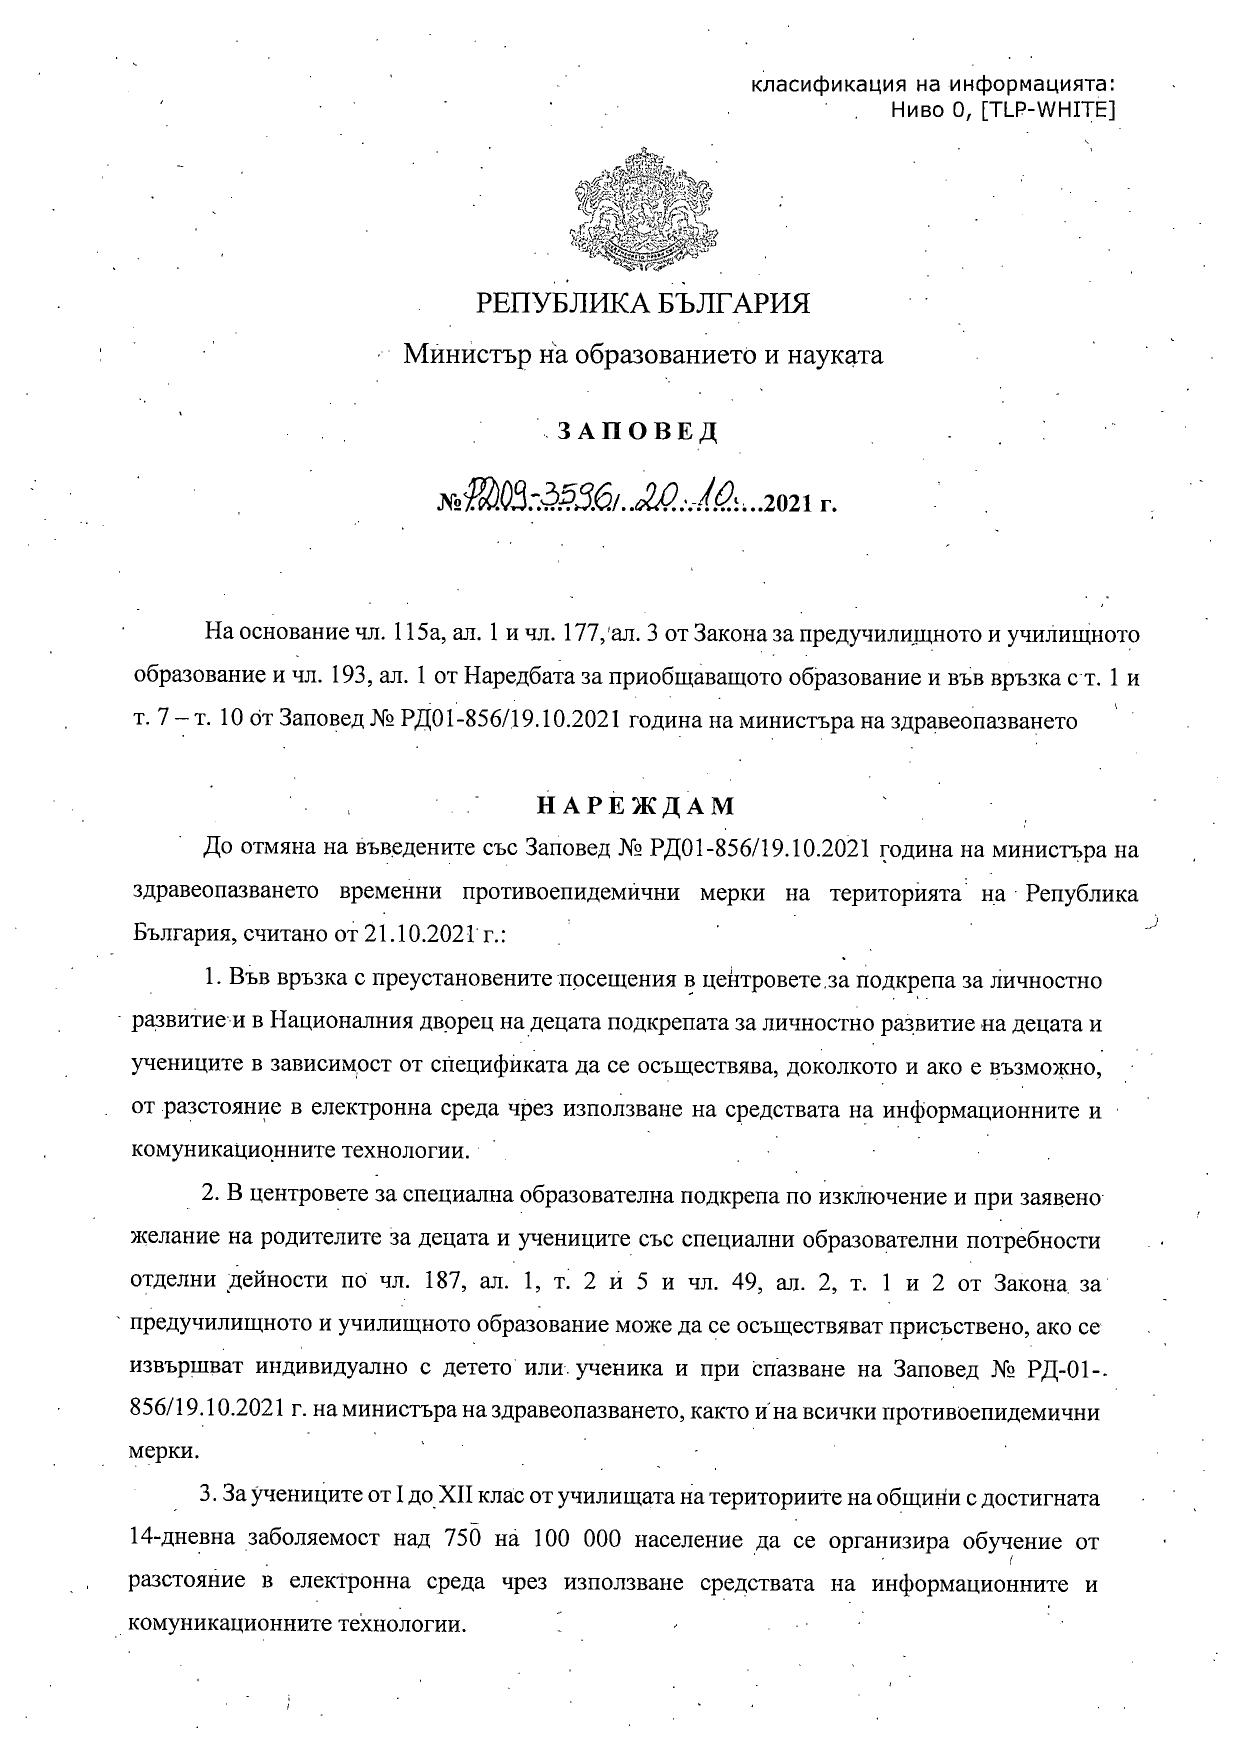 Заповед МОН 20.10.2021